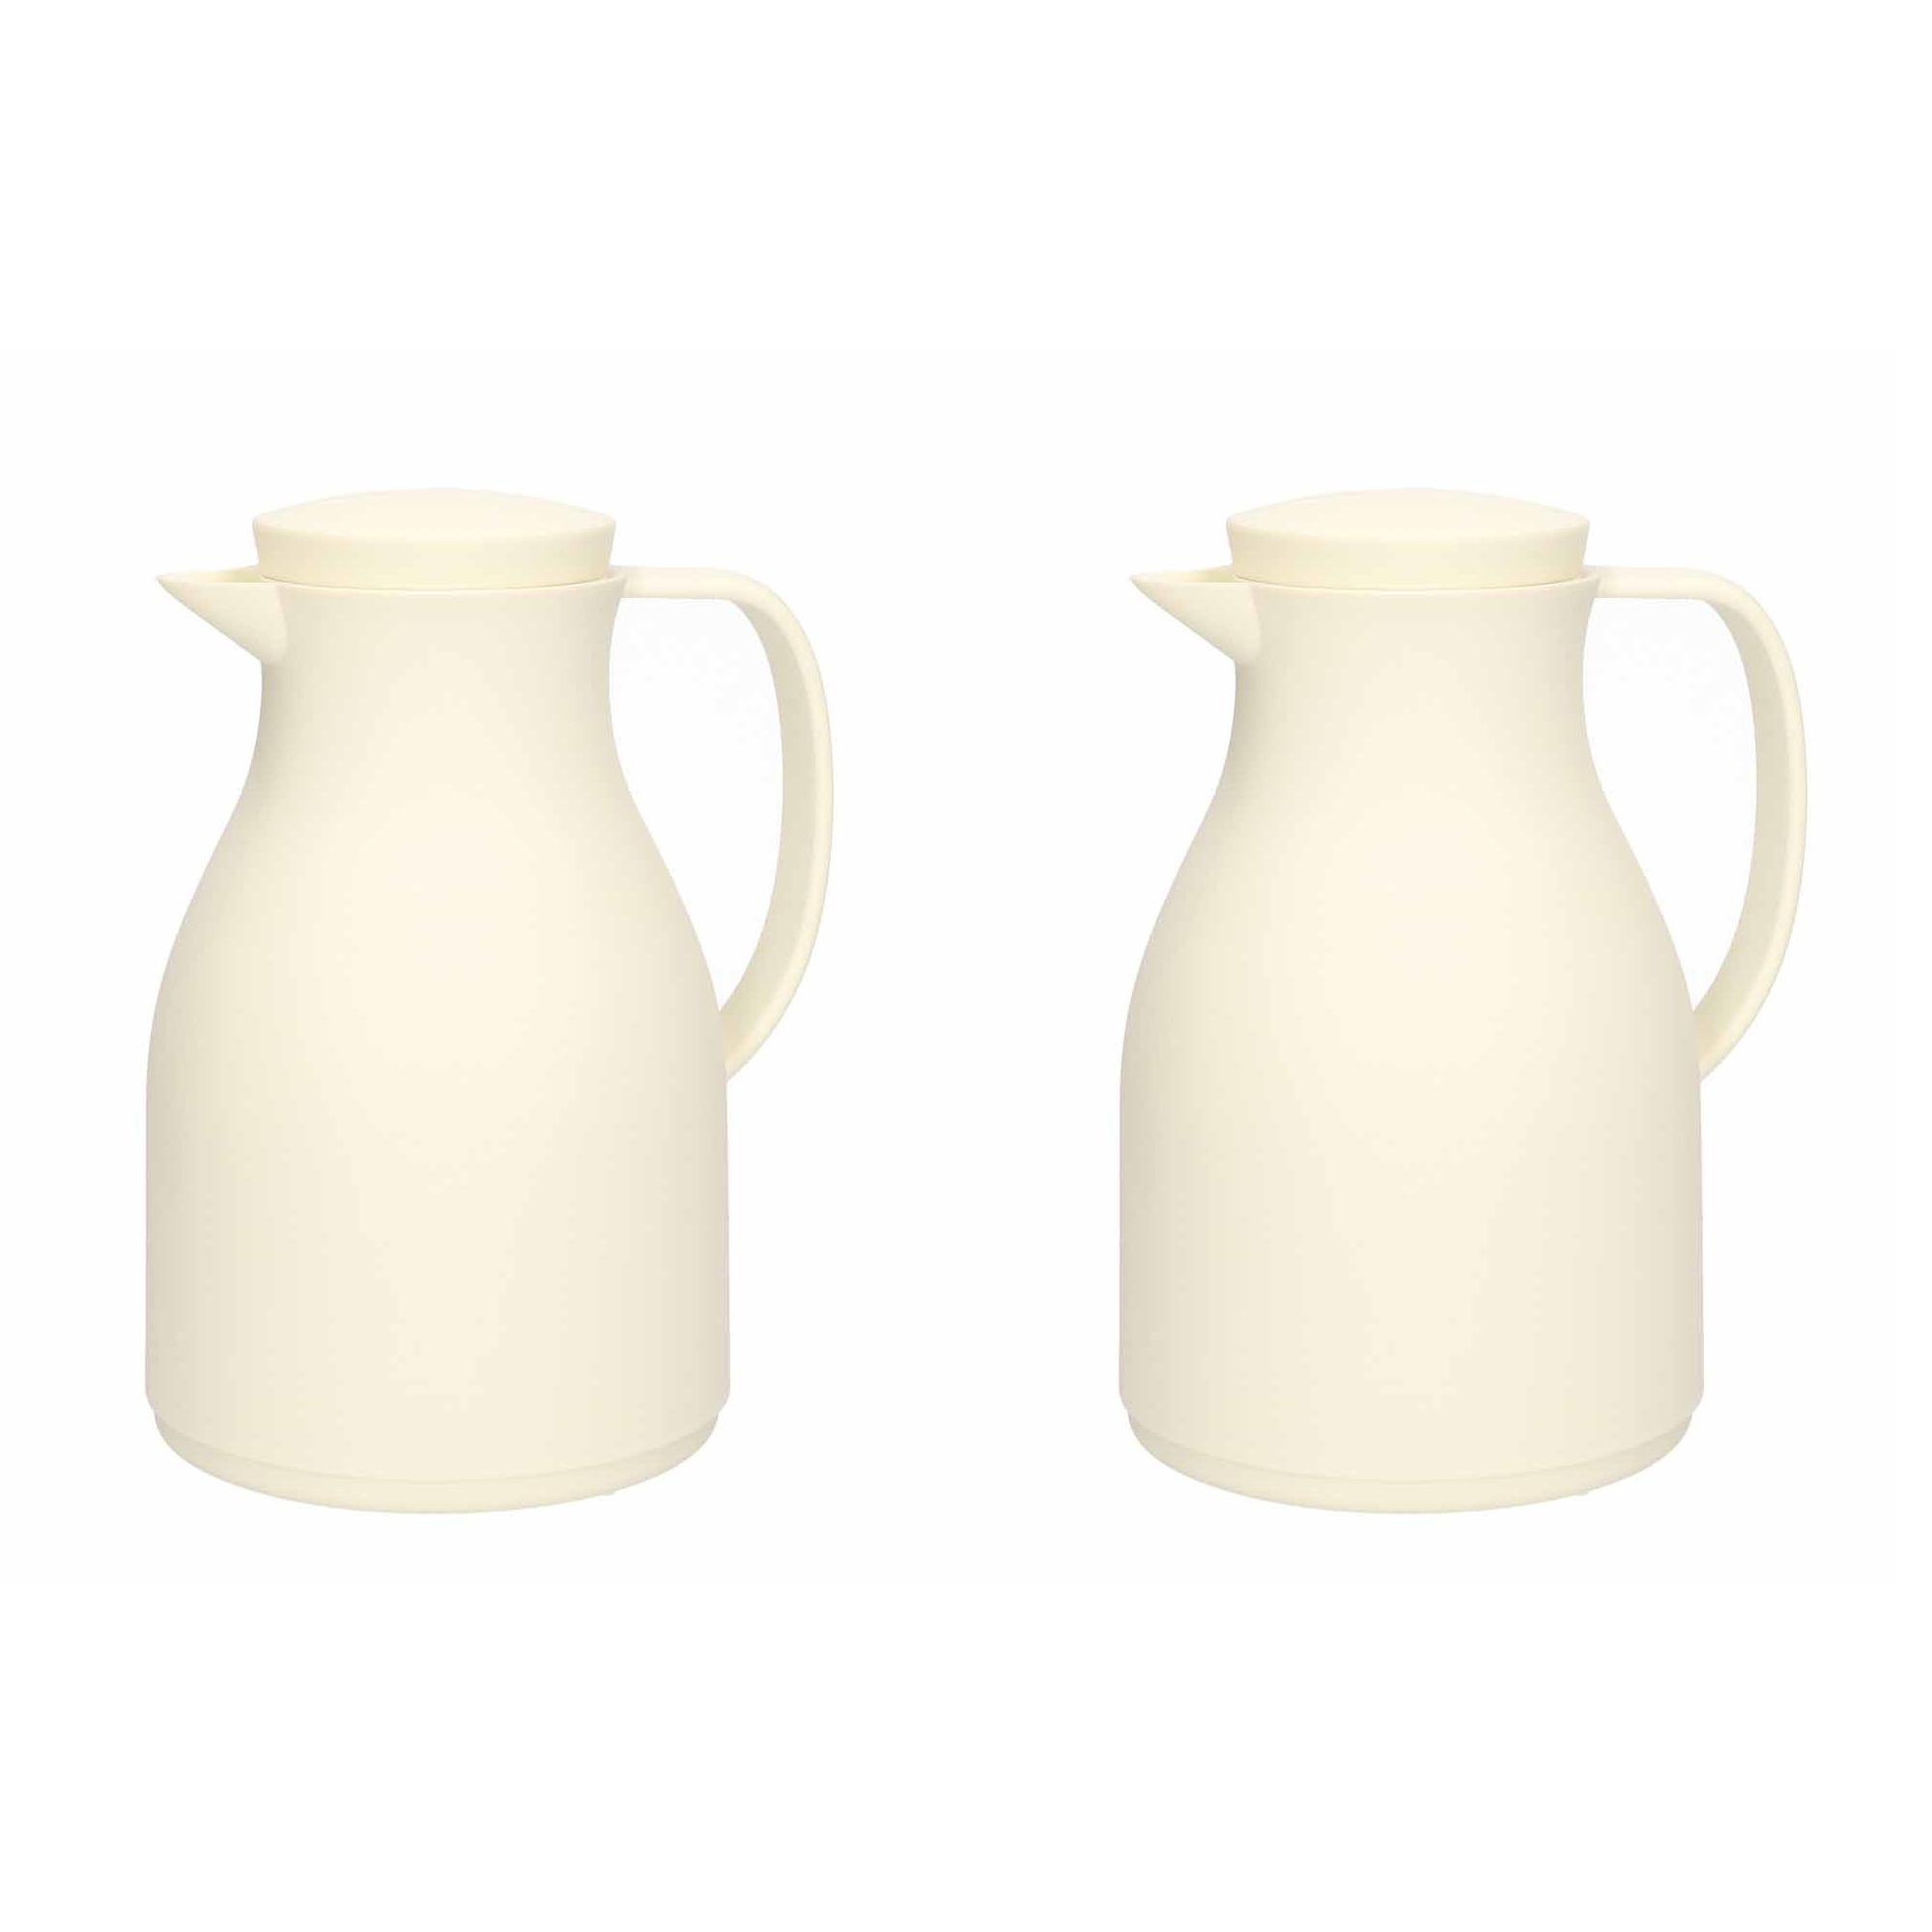 2x Isoleerkan/koffiekan wit 1 liter met drukknop -